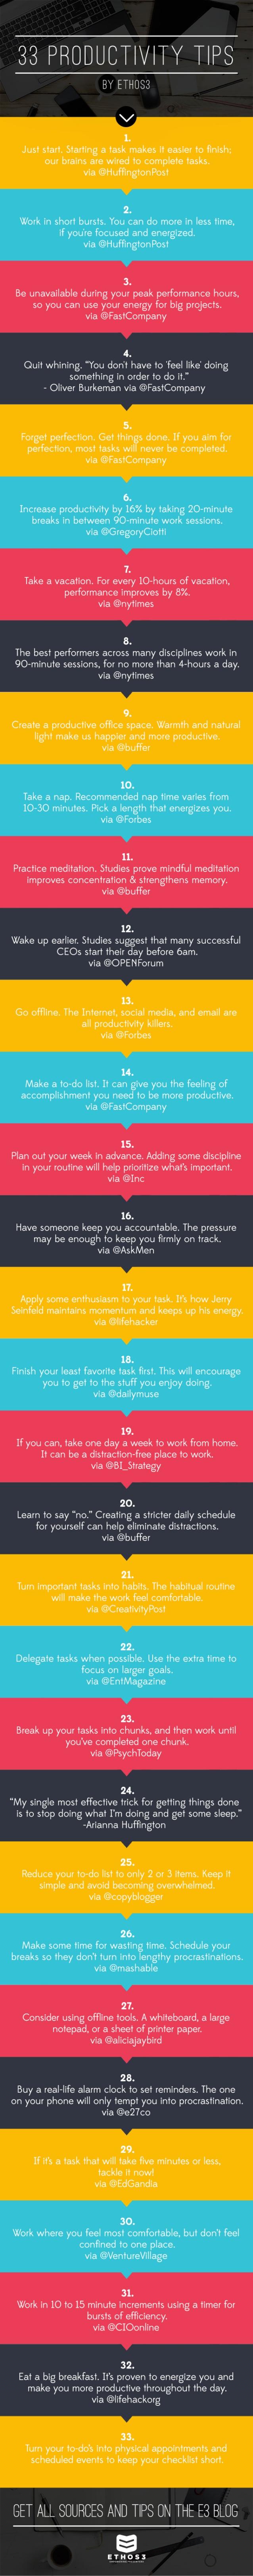 33 consejos sobre productividad en 140 caracteres